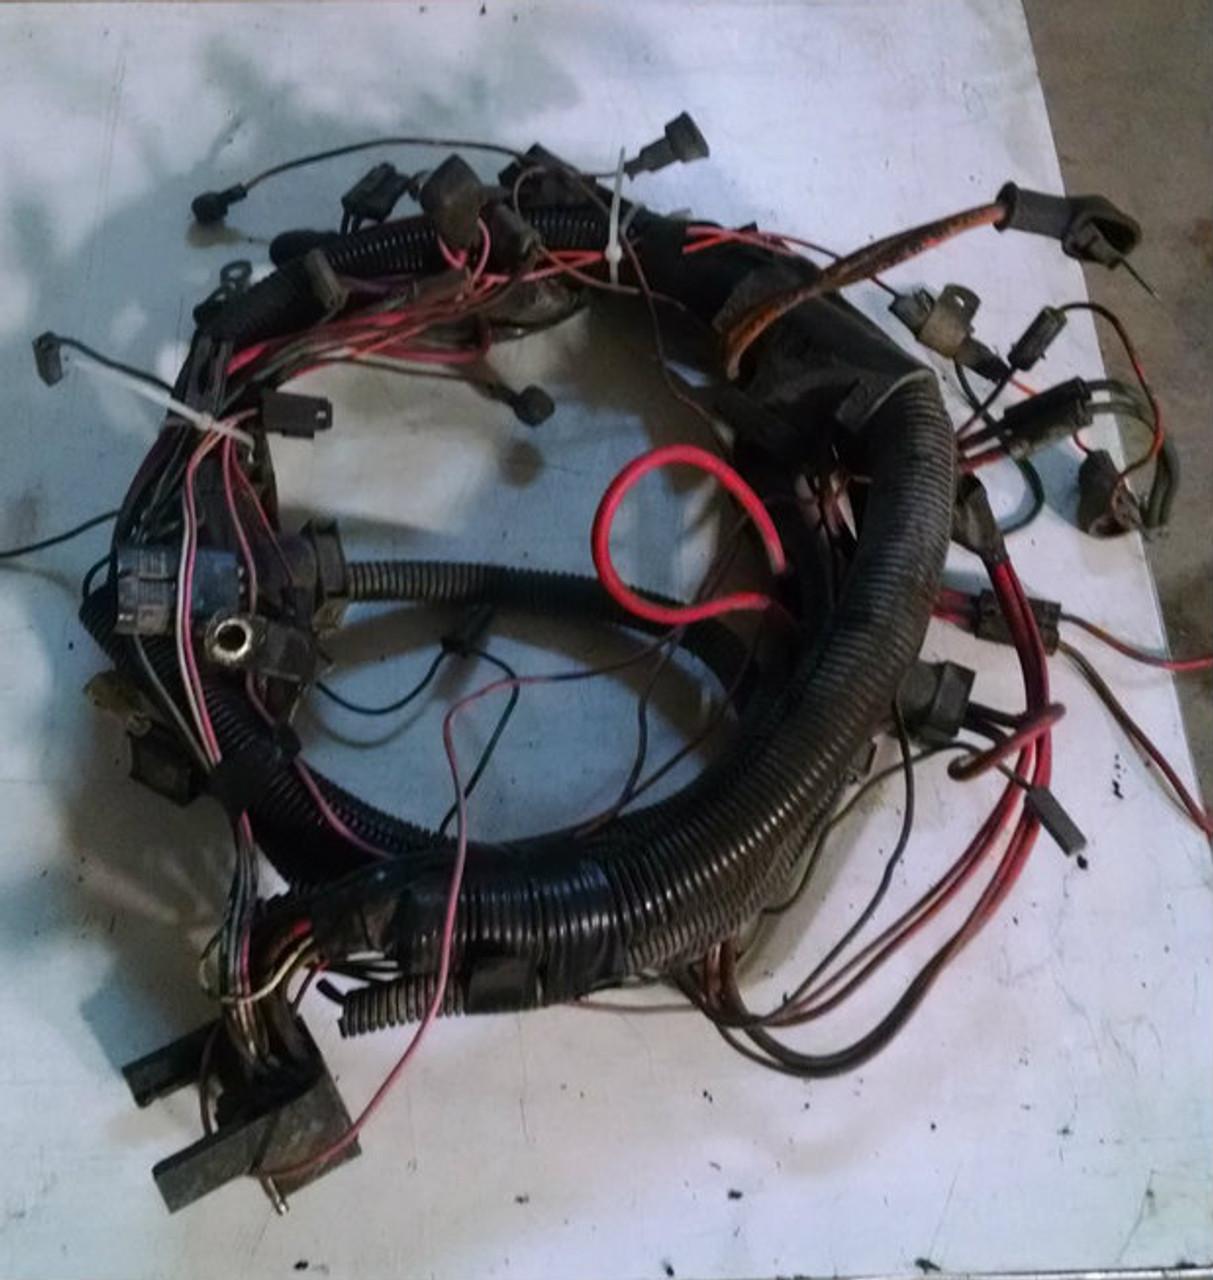 CUCV Engine Wiring Harness on jeep wiring diagram, m813 wiring diagram, cucv wiring diagram, m38a1 wiring diagram, vehicle wiring diagram, humvee wiring diagram, truck wiring diagram, m11 wiring diagram, m939 wiring diagram, m1010 wiring diagram, m1009 wiring diagram, hummer wiring diagram, willys wiring diagram, gpw wiring diagram, 4x4 wiring diagram, m12 wiring diagram, mutt wiring diagram, m37 wiring diagram, blazer wiring diagram, hmmwv wiring diagram,